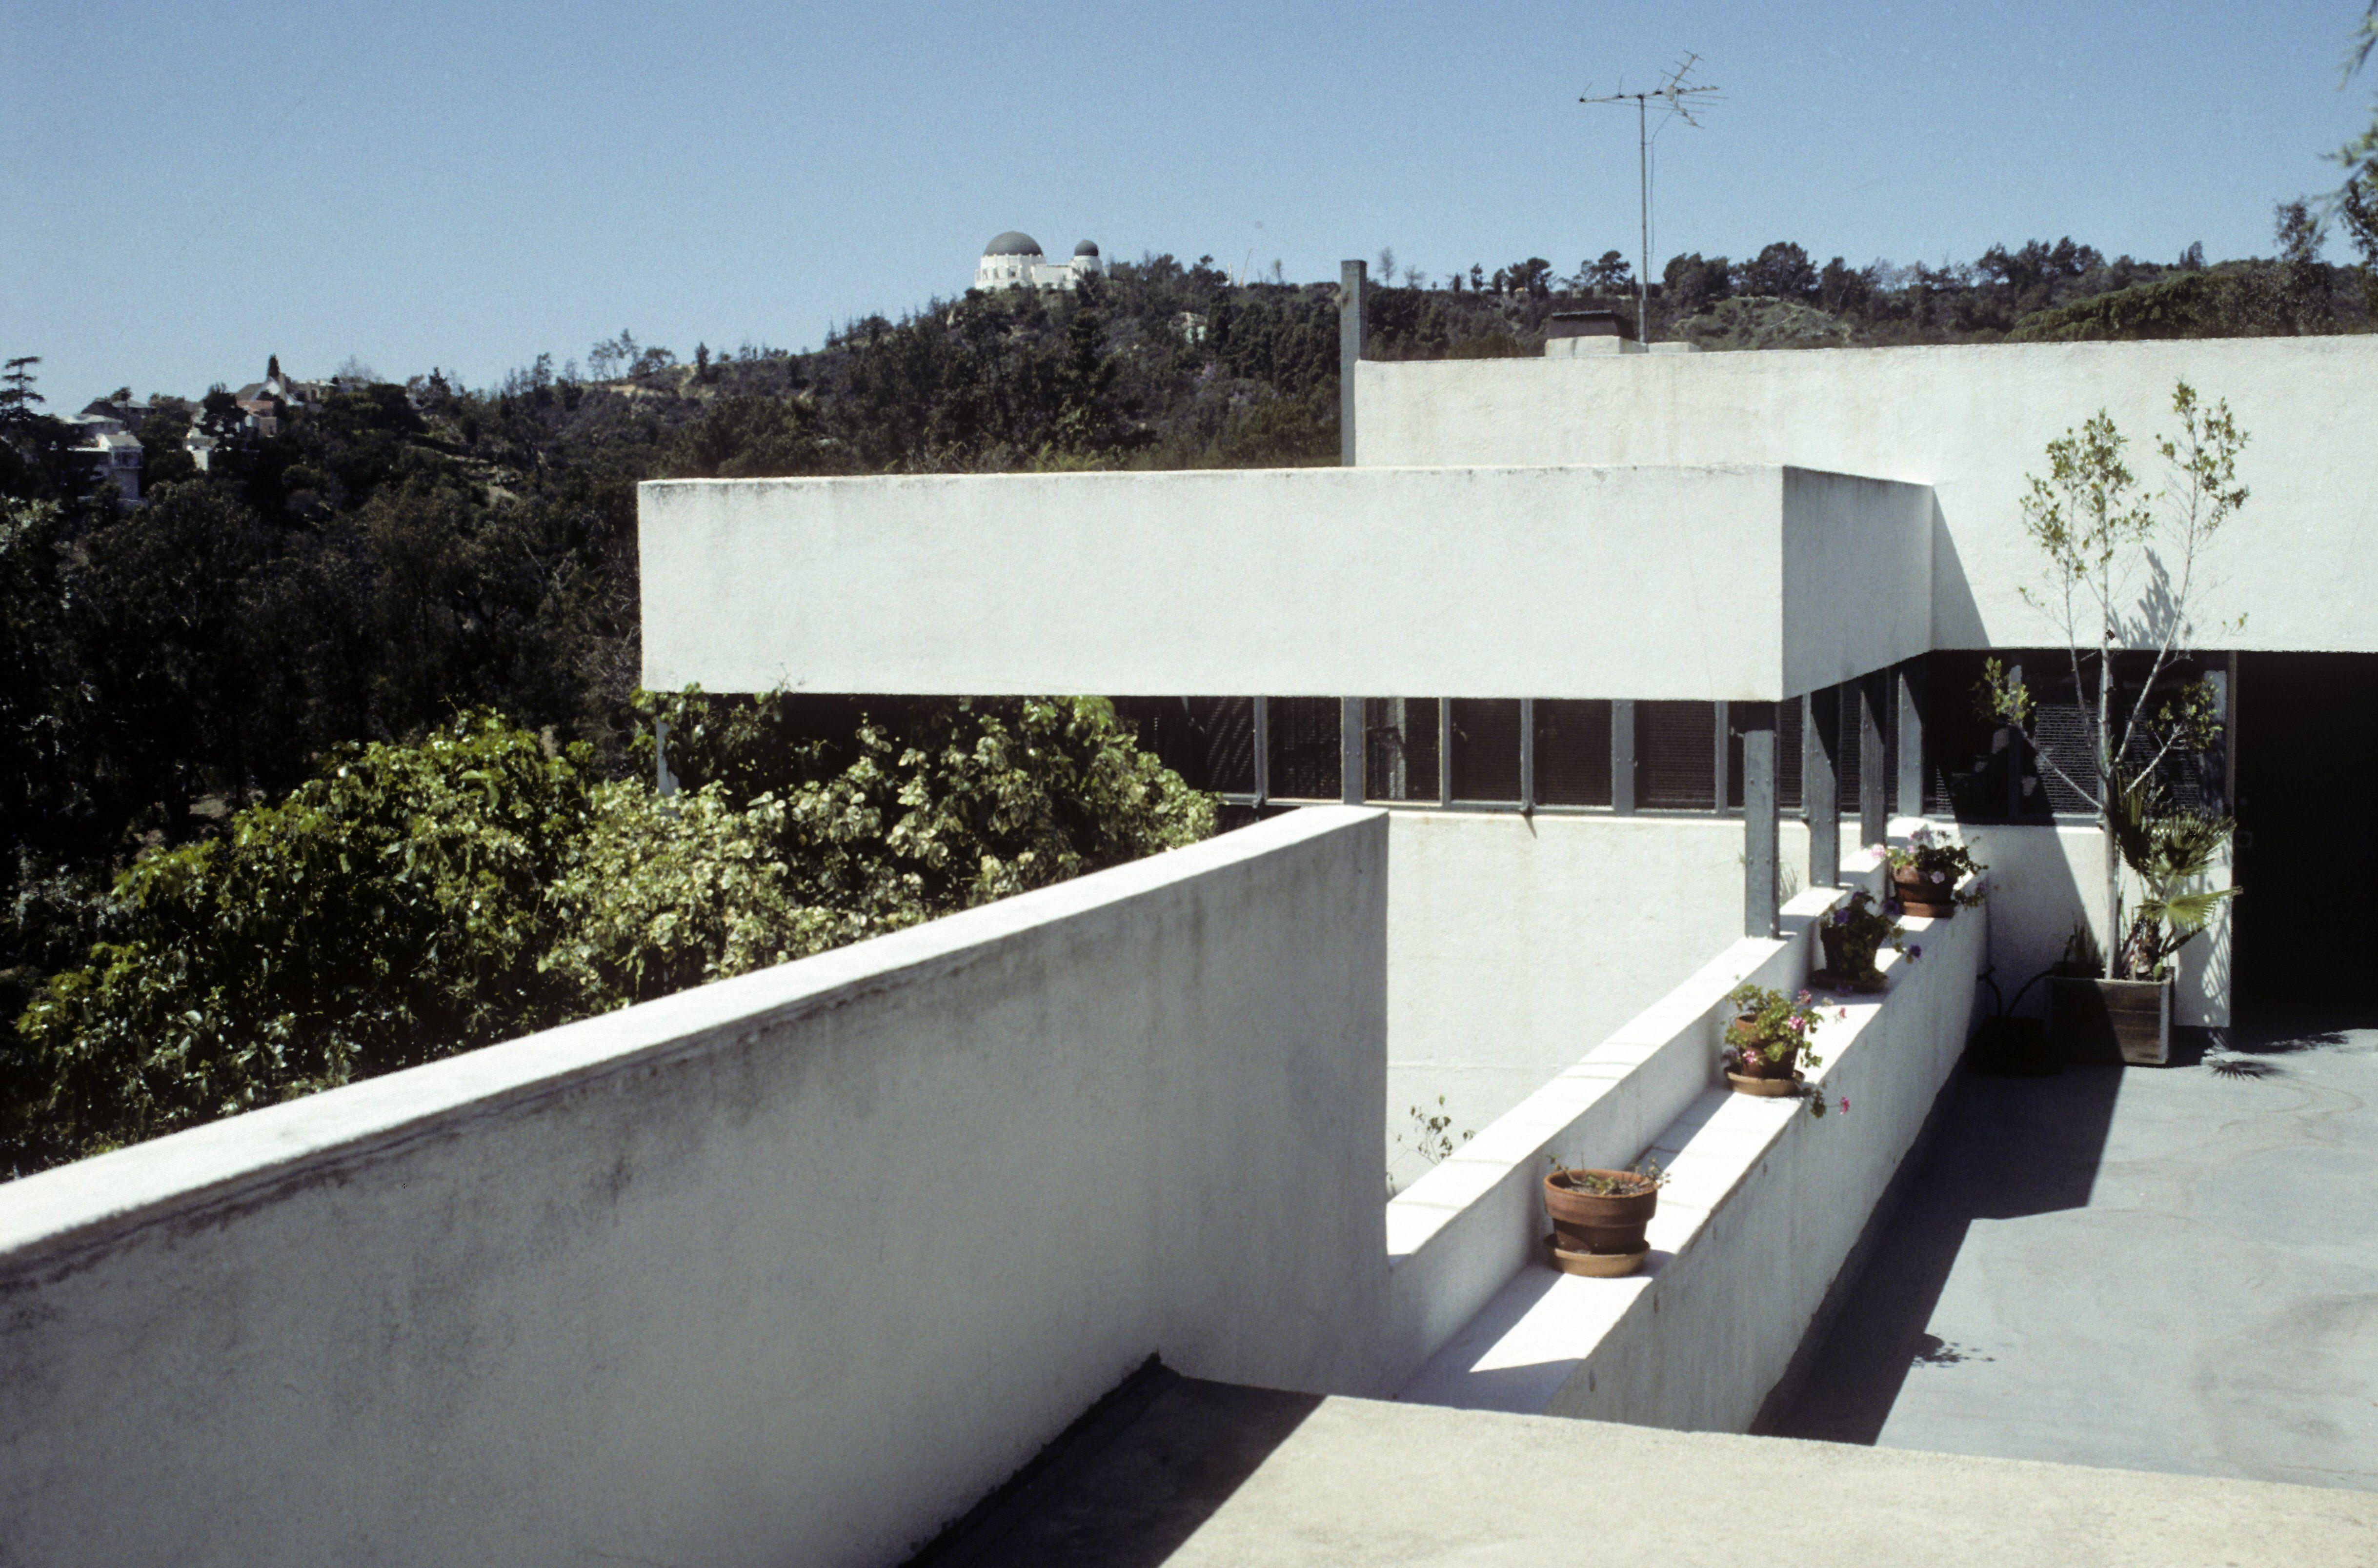 Richard Neutra designed Lovell House, International Style, in Los Angeles, California